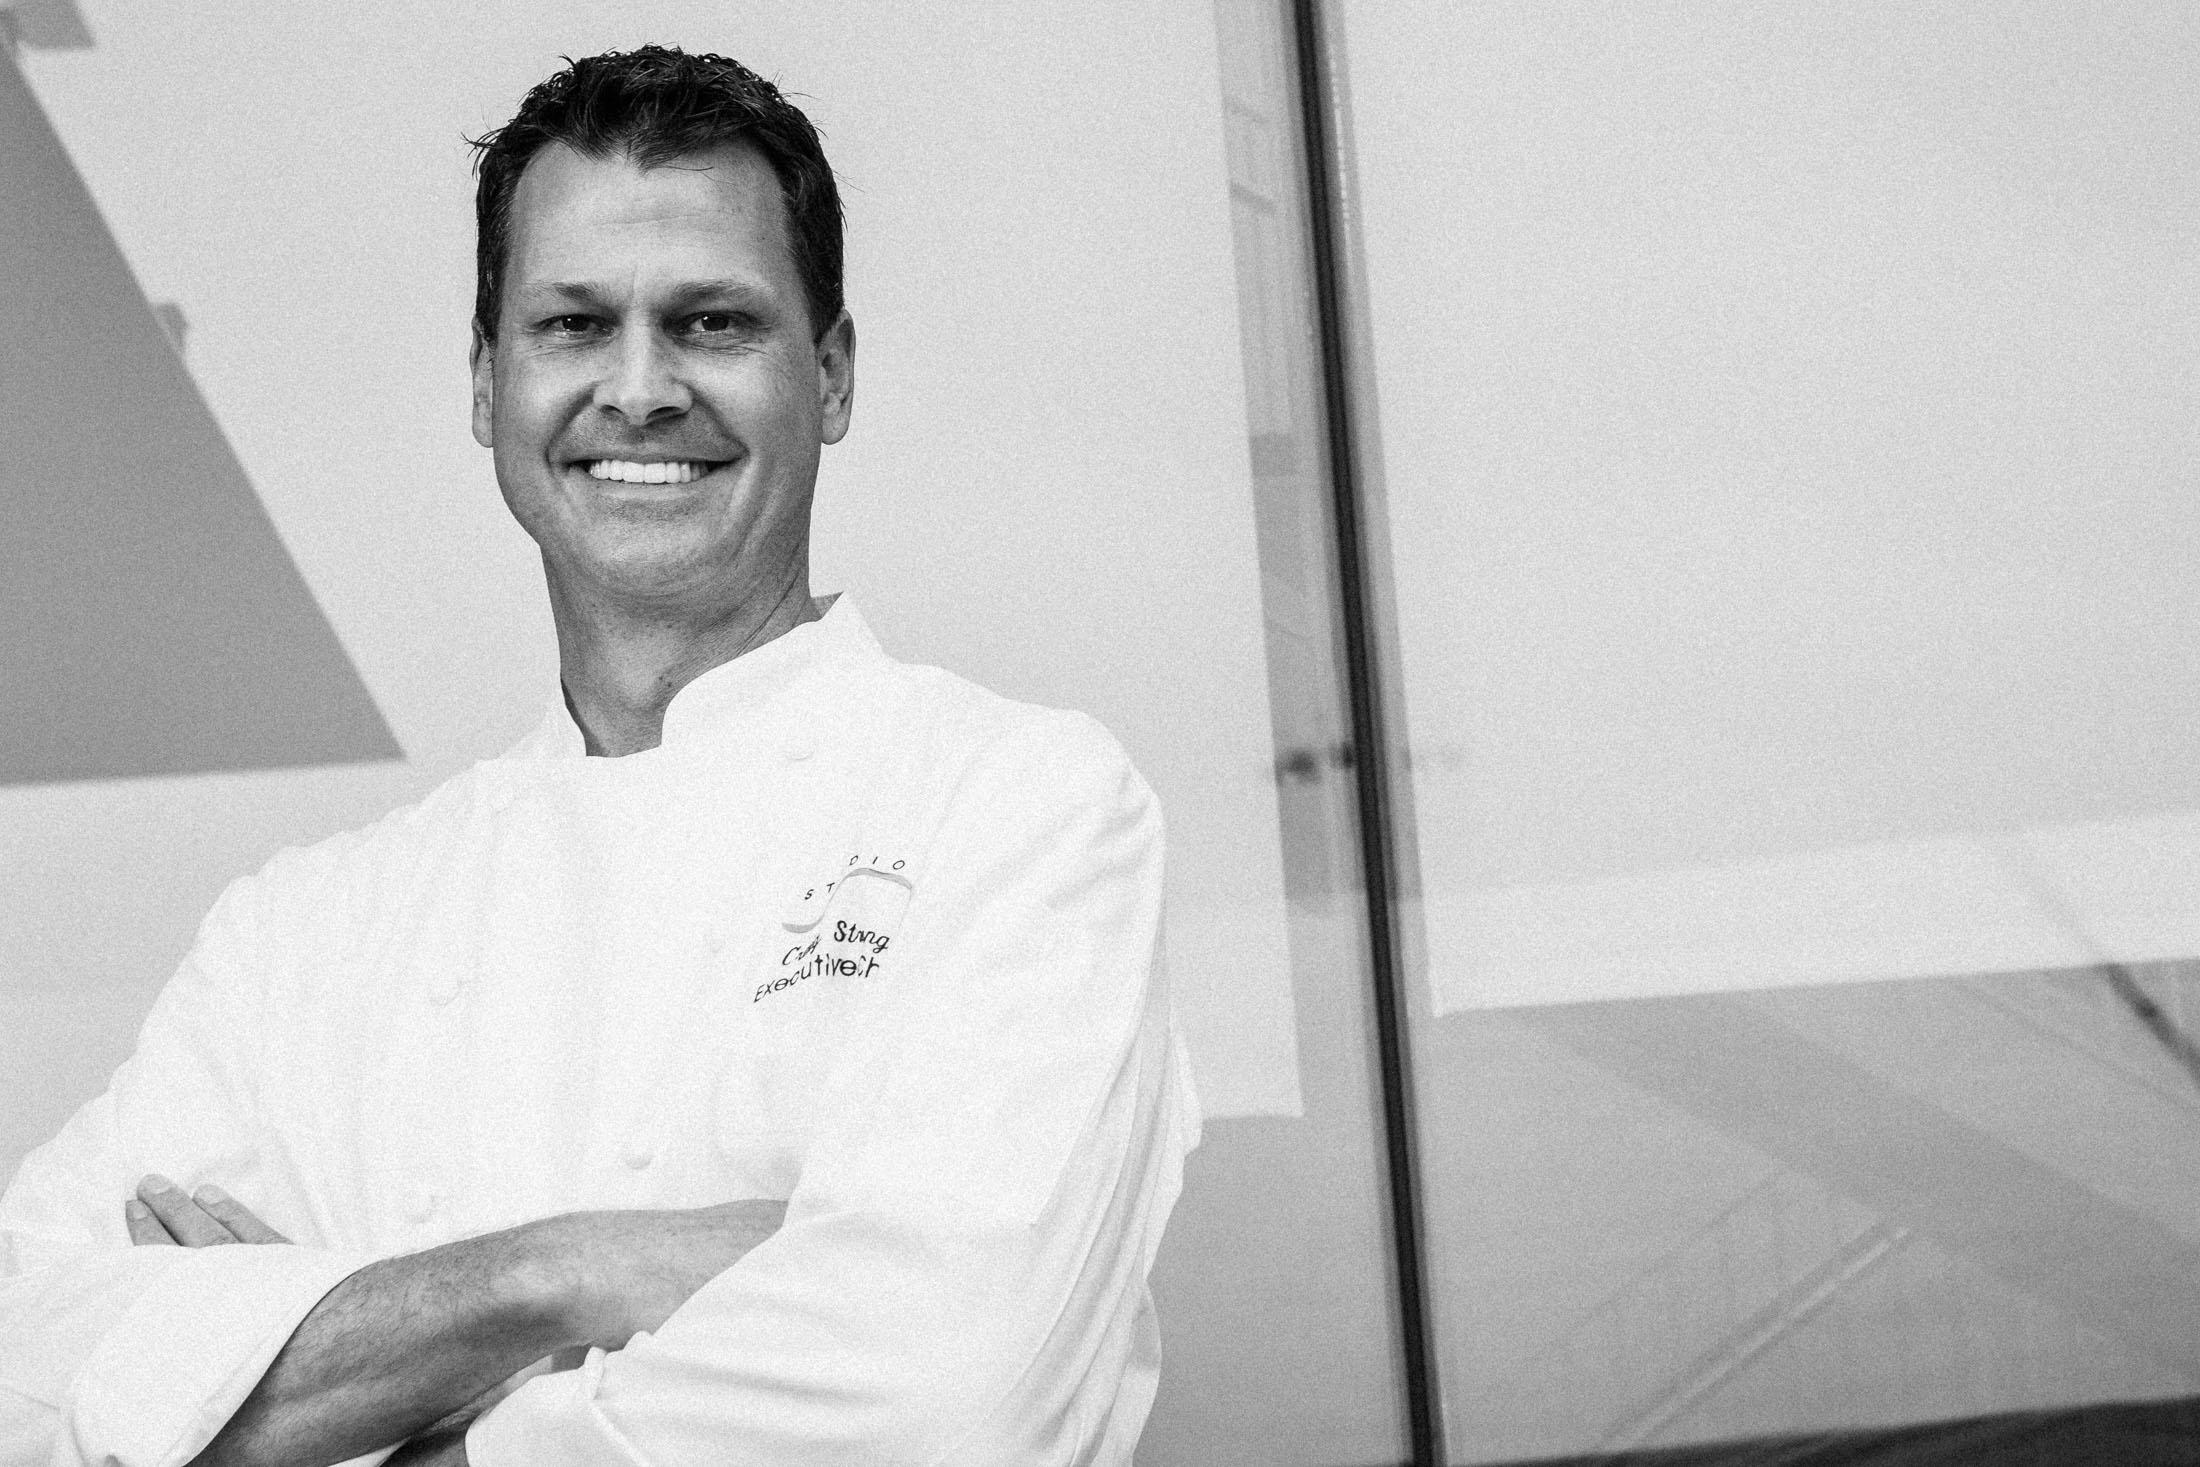 1. Chef Craig Strong / Studio @ Montage / Laguna Beach, California